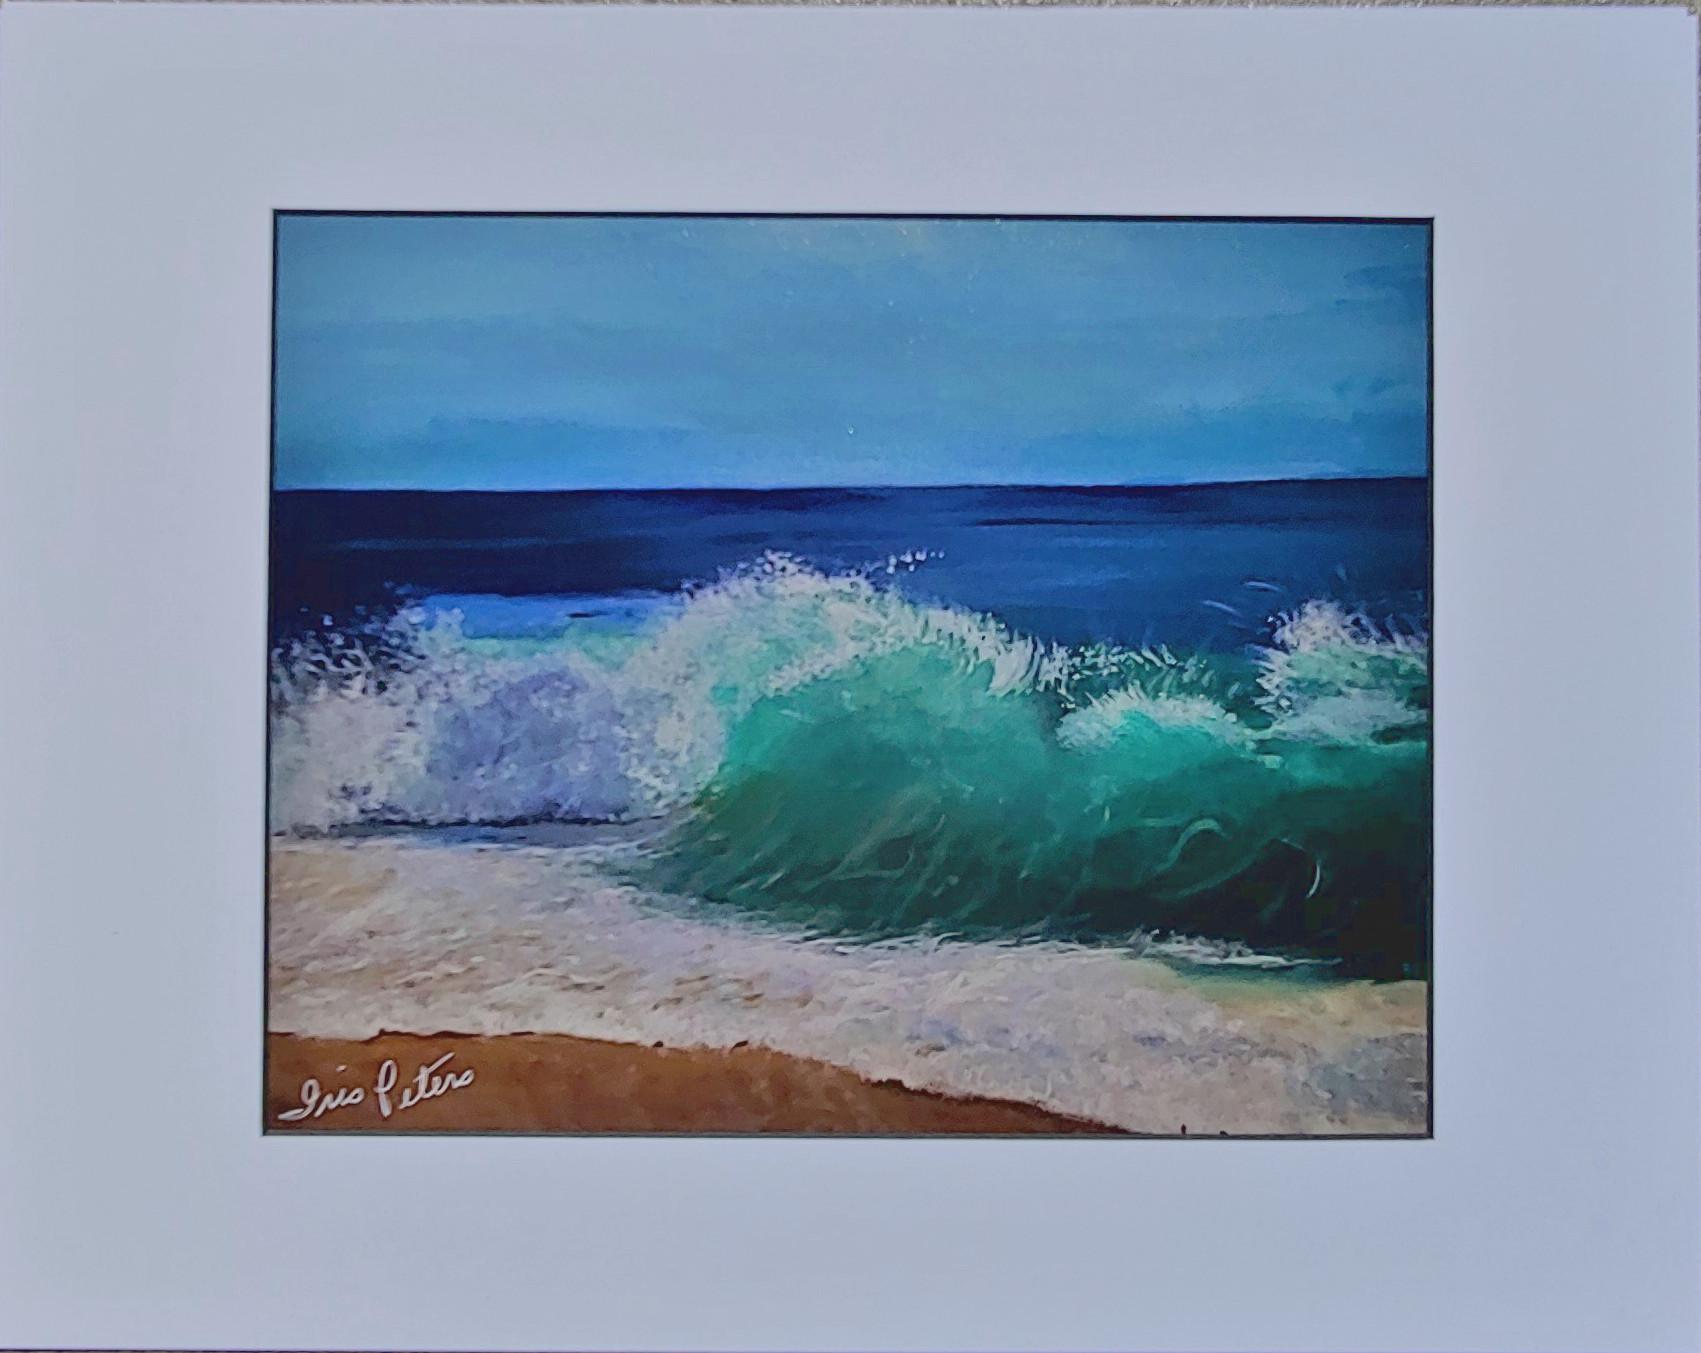 ocean wave print    total size  14 x 11   $25